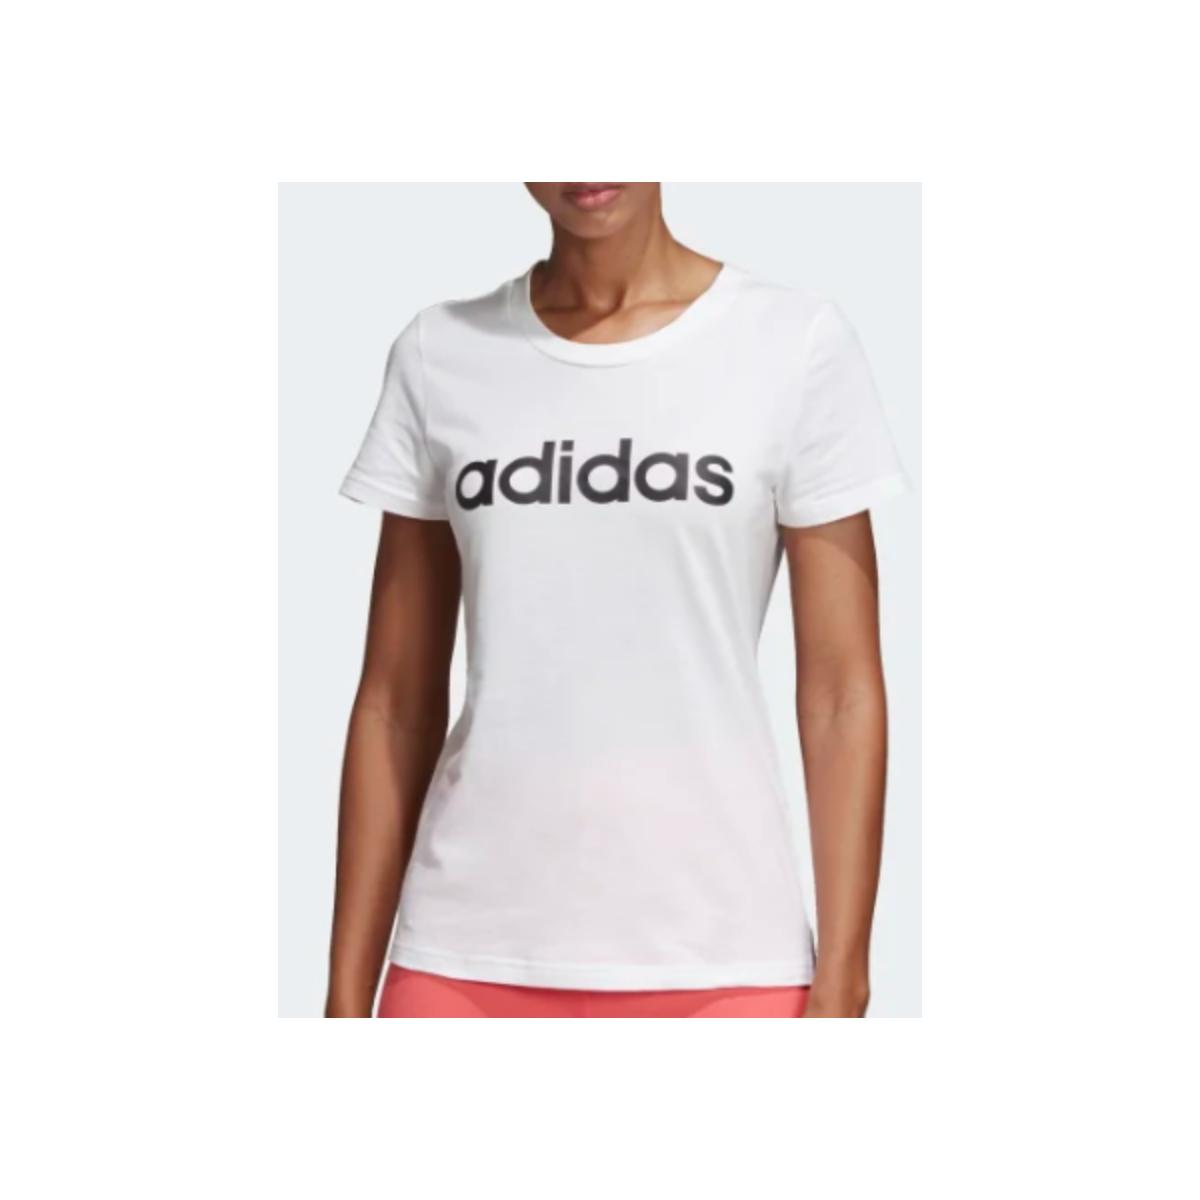 T-shirt Feminino Adidas Du0629 w e Lin Slim t Off White